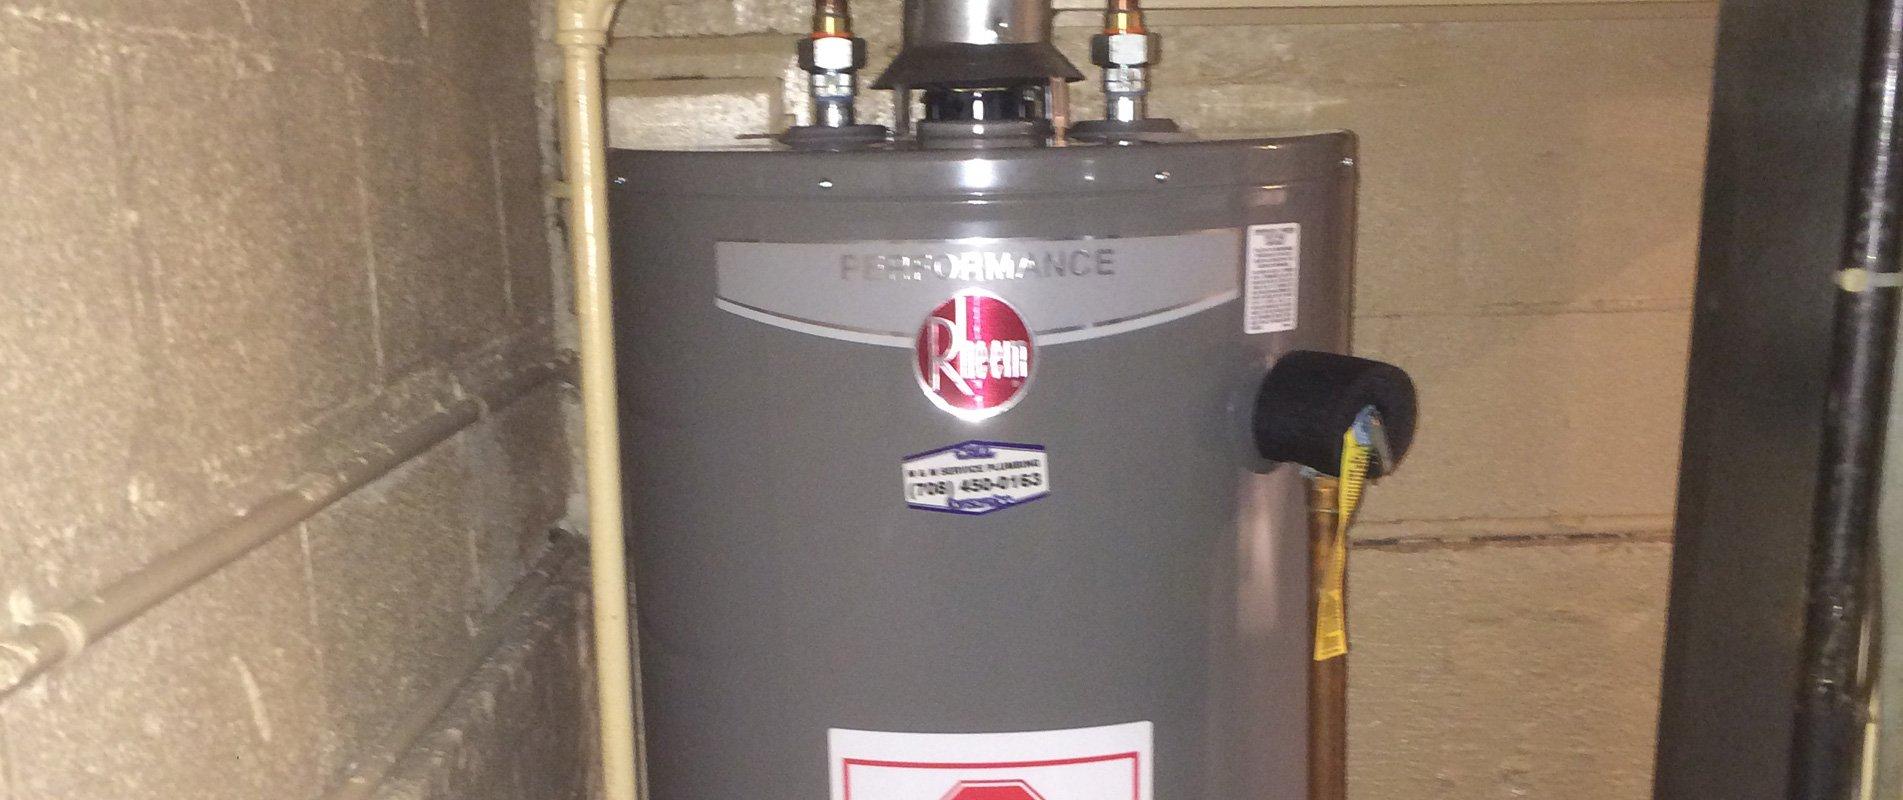 Rheem hot water heater